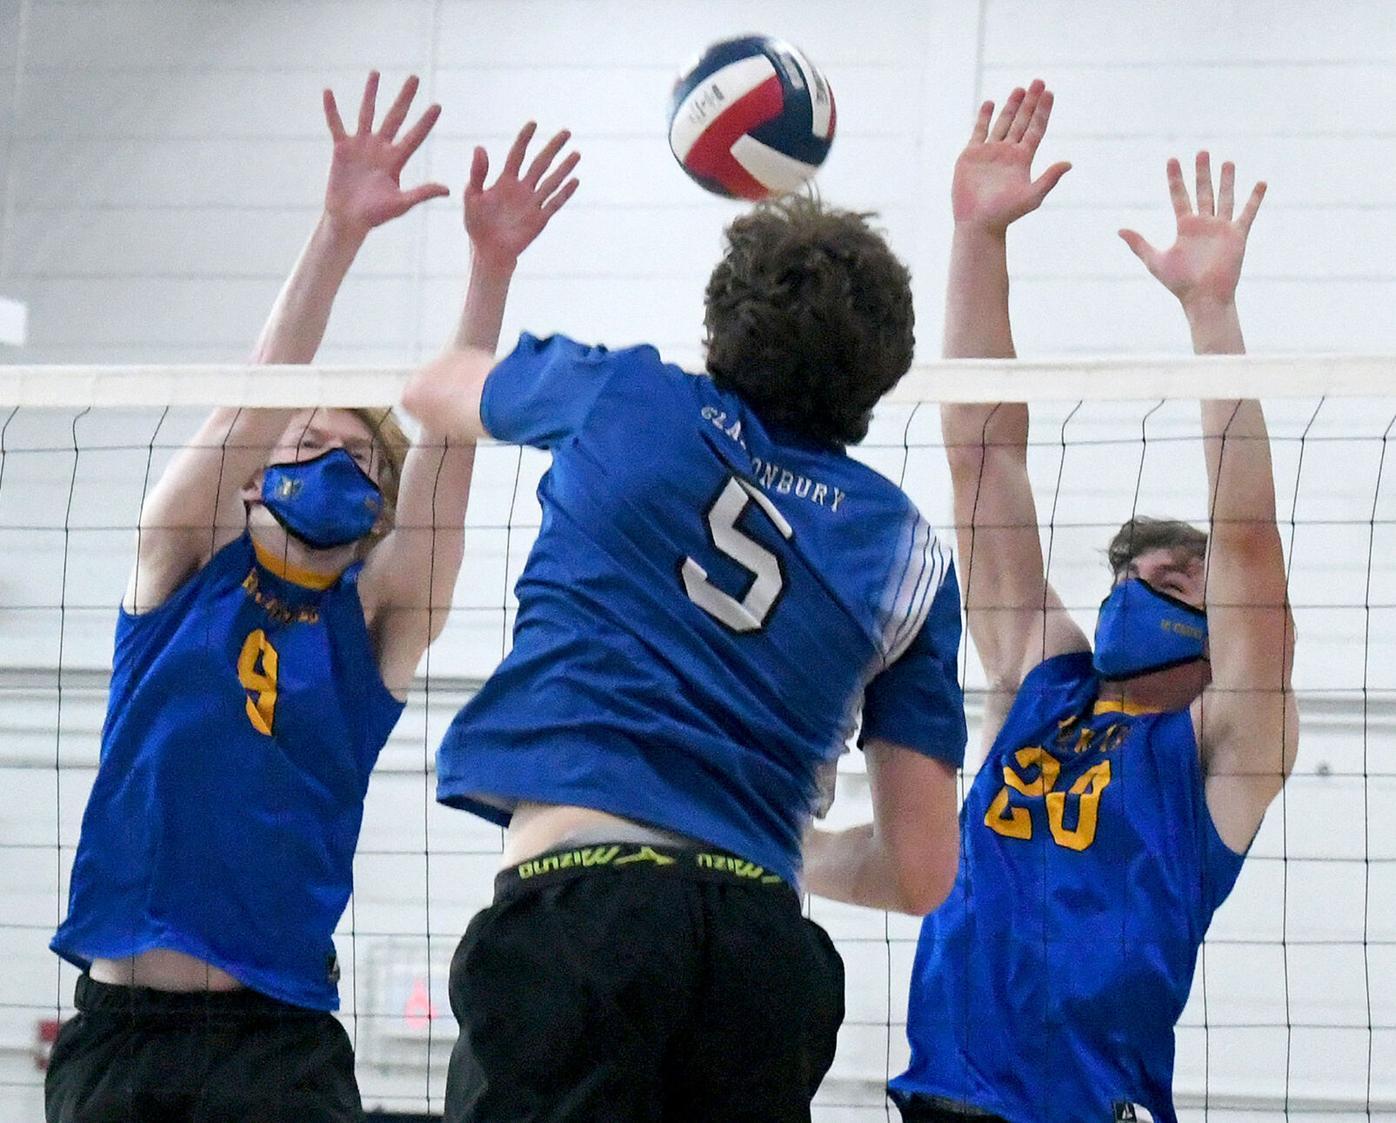 050421 Volleyball 01a.jpg